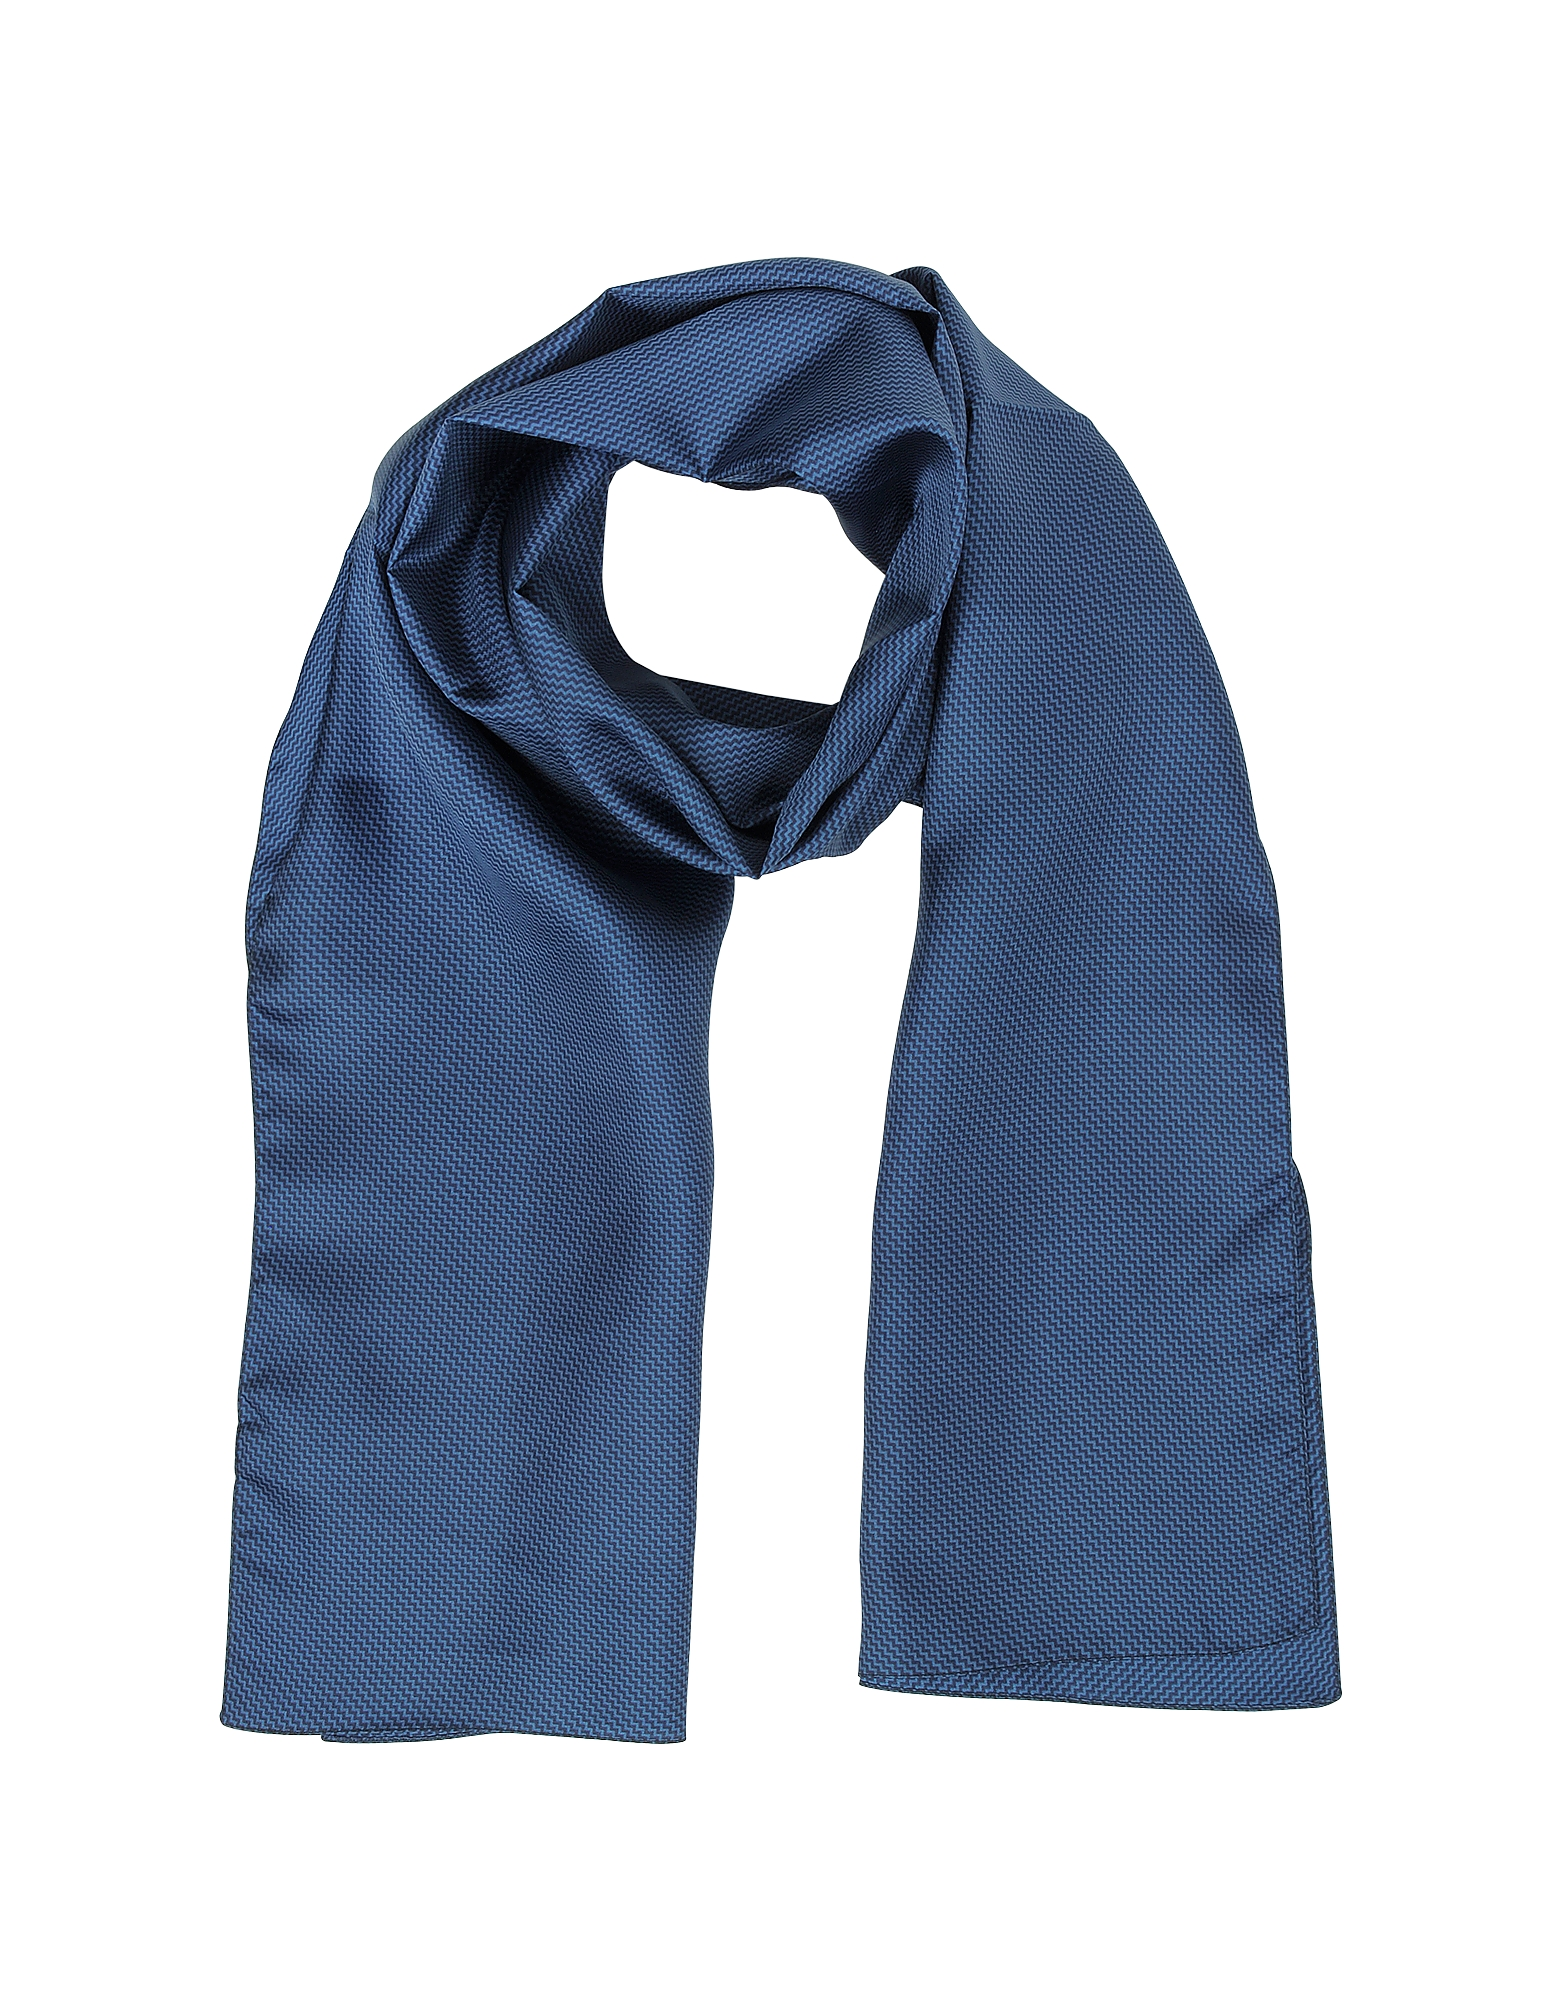 Forzieri Men's Scarves, Small Zig-Zag Print Twill Silk Men's Scarf